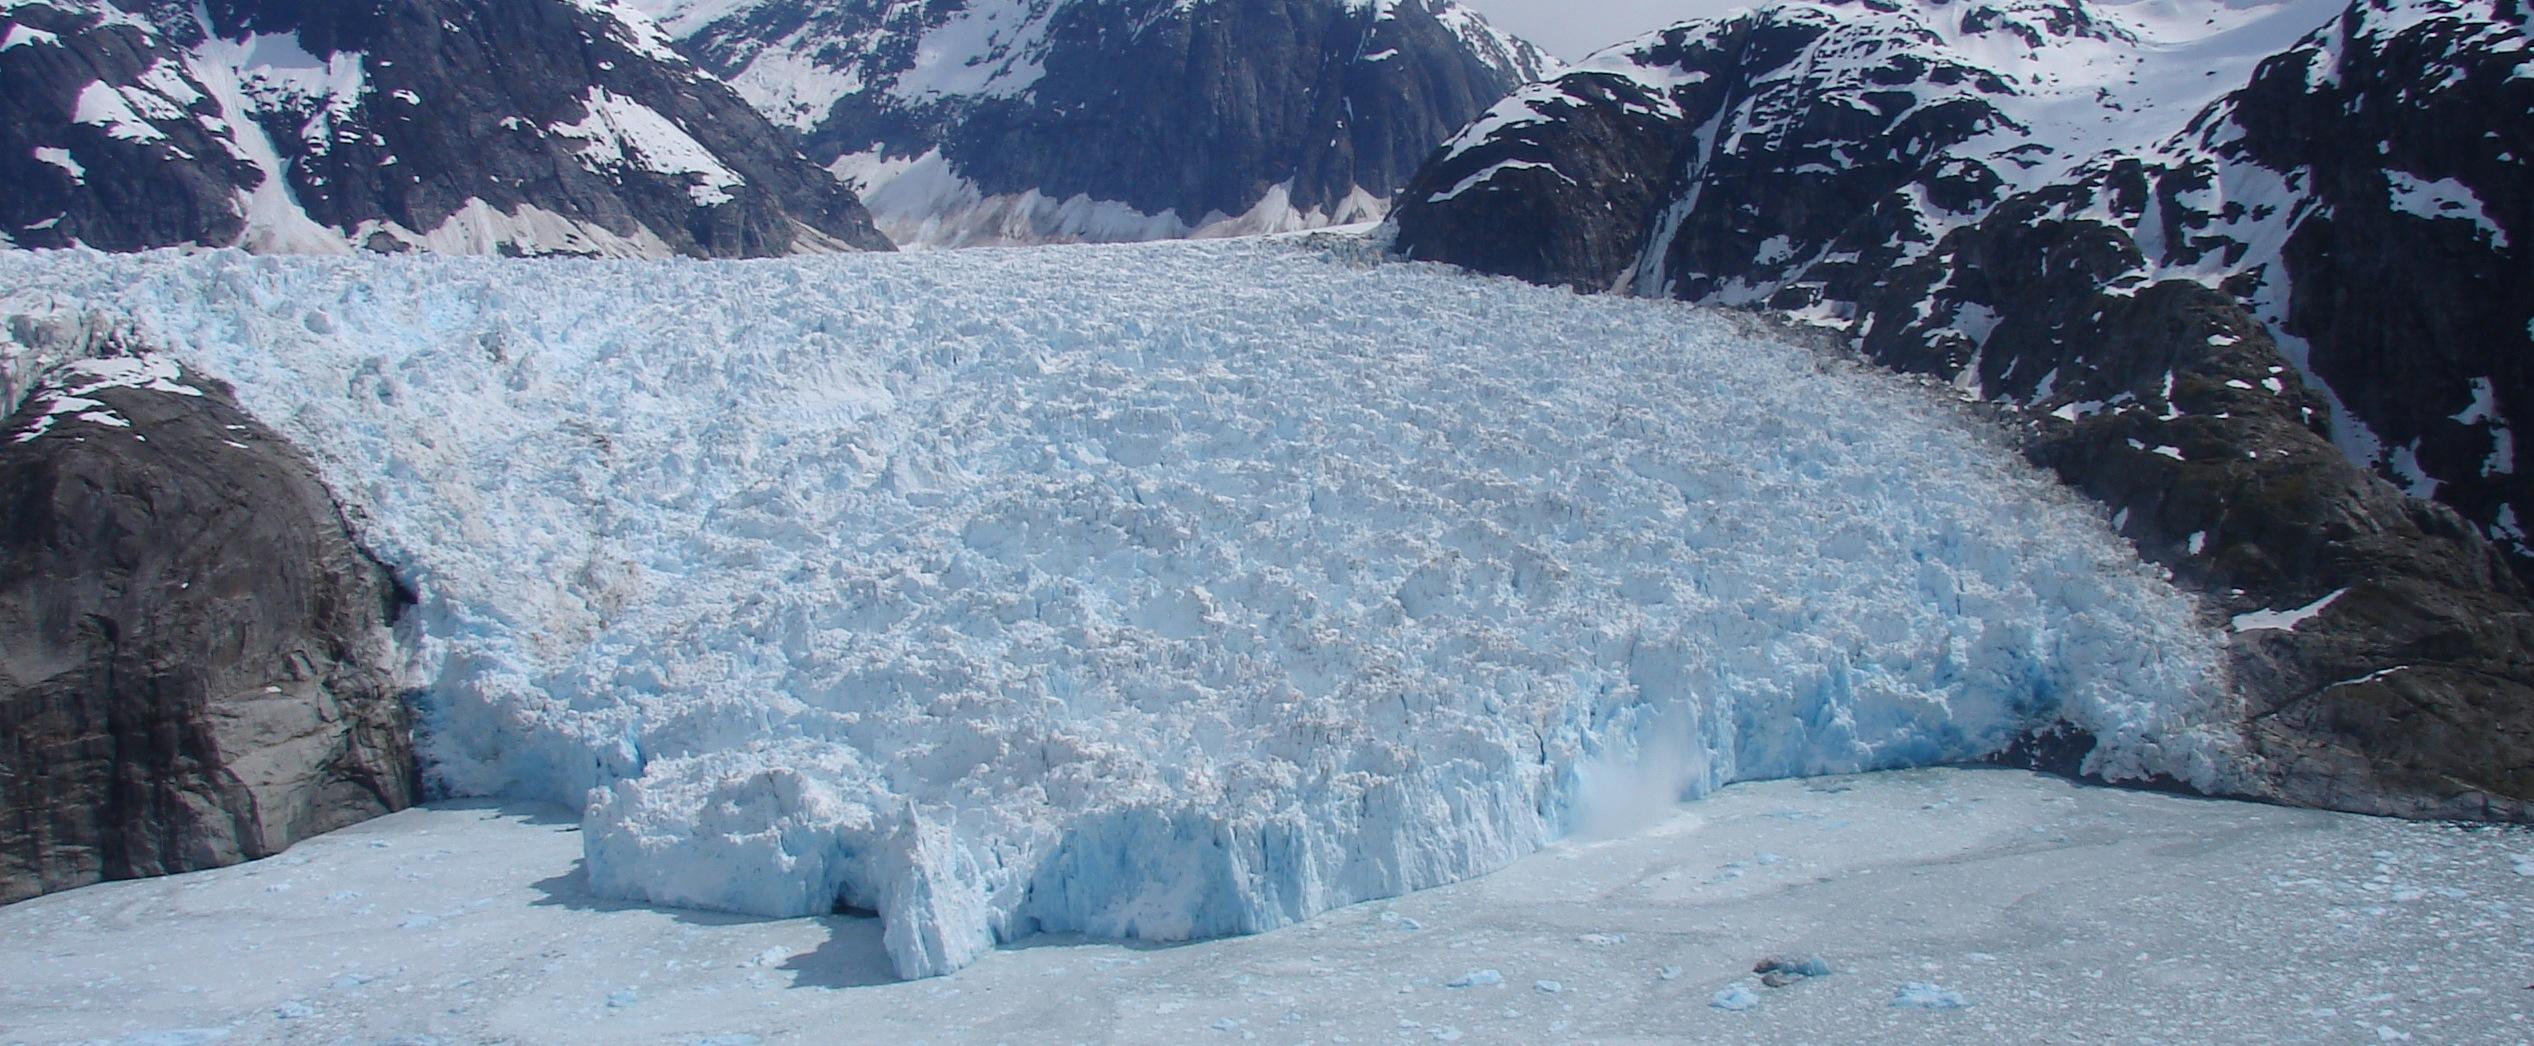 Scientists look at dynamics of melting at Southeast Alaska glacier